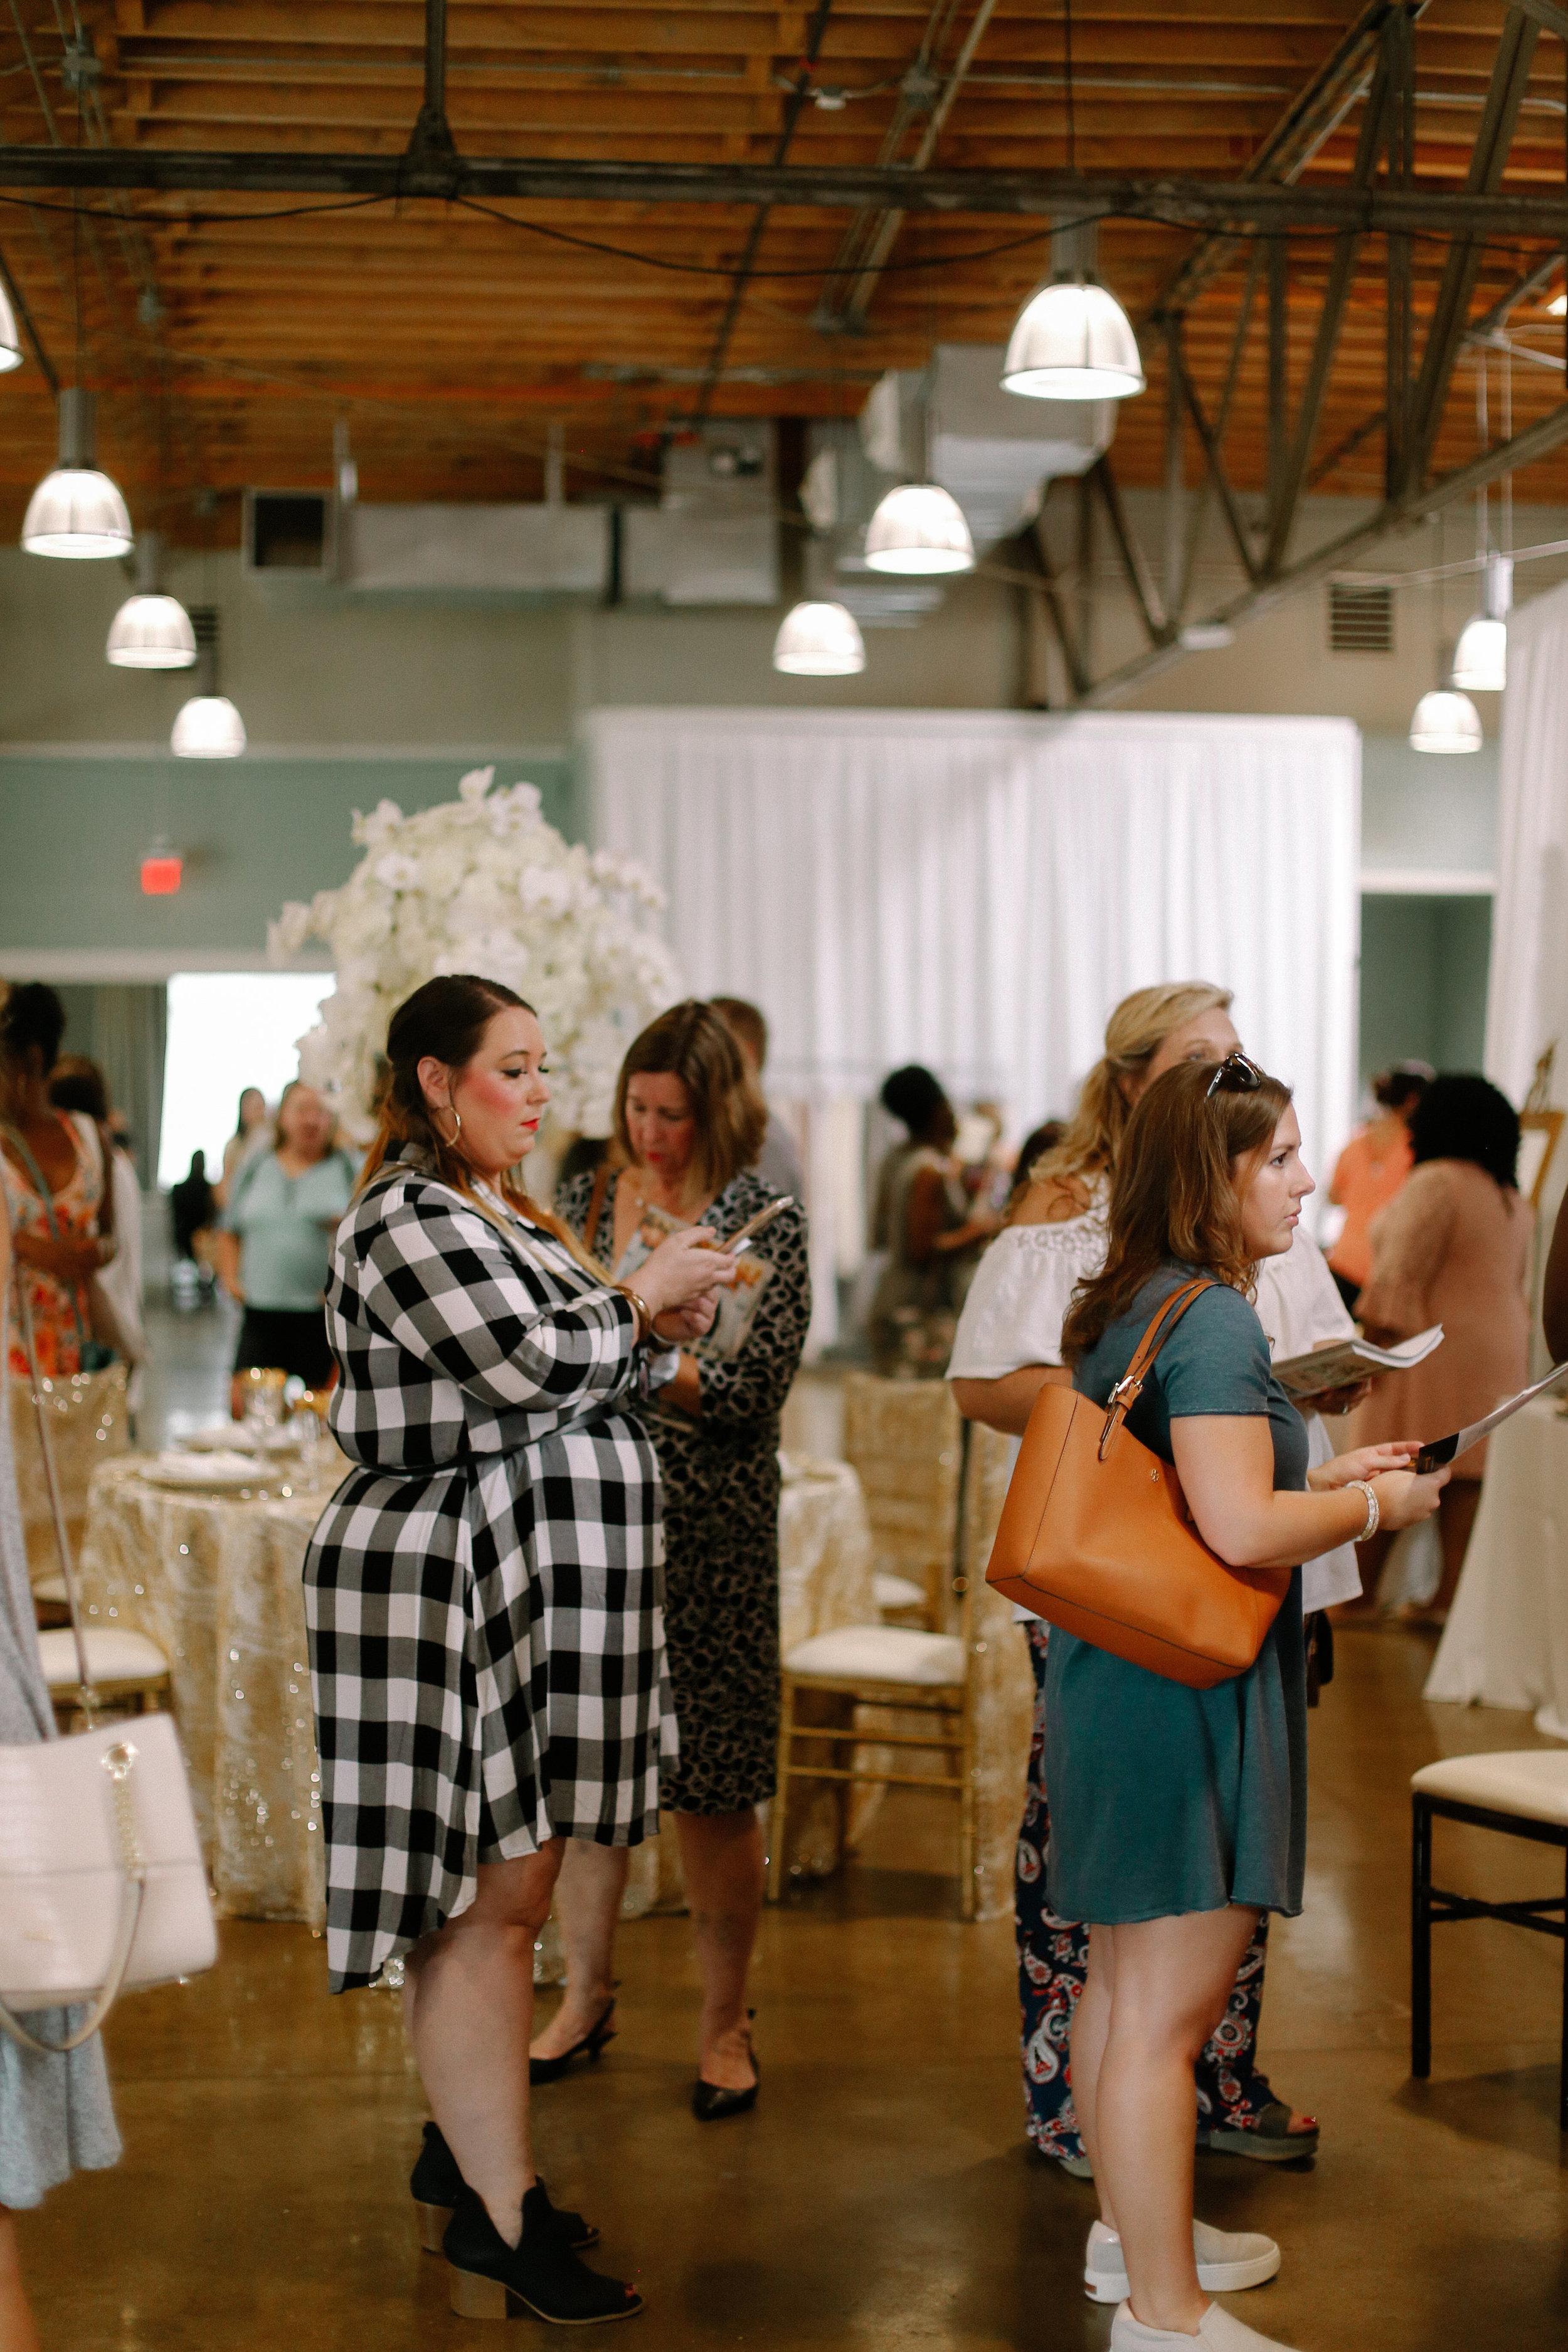 Engaged Event-Engaged Event-0130.jpg